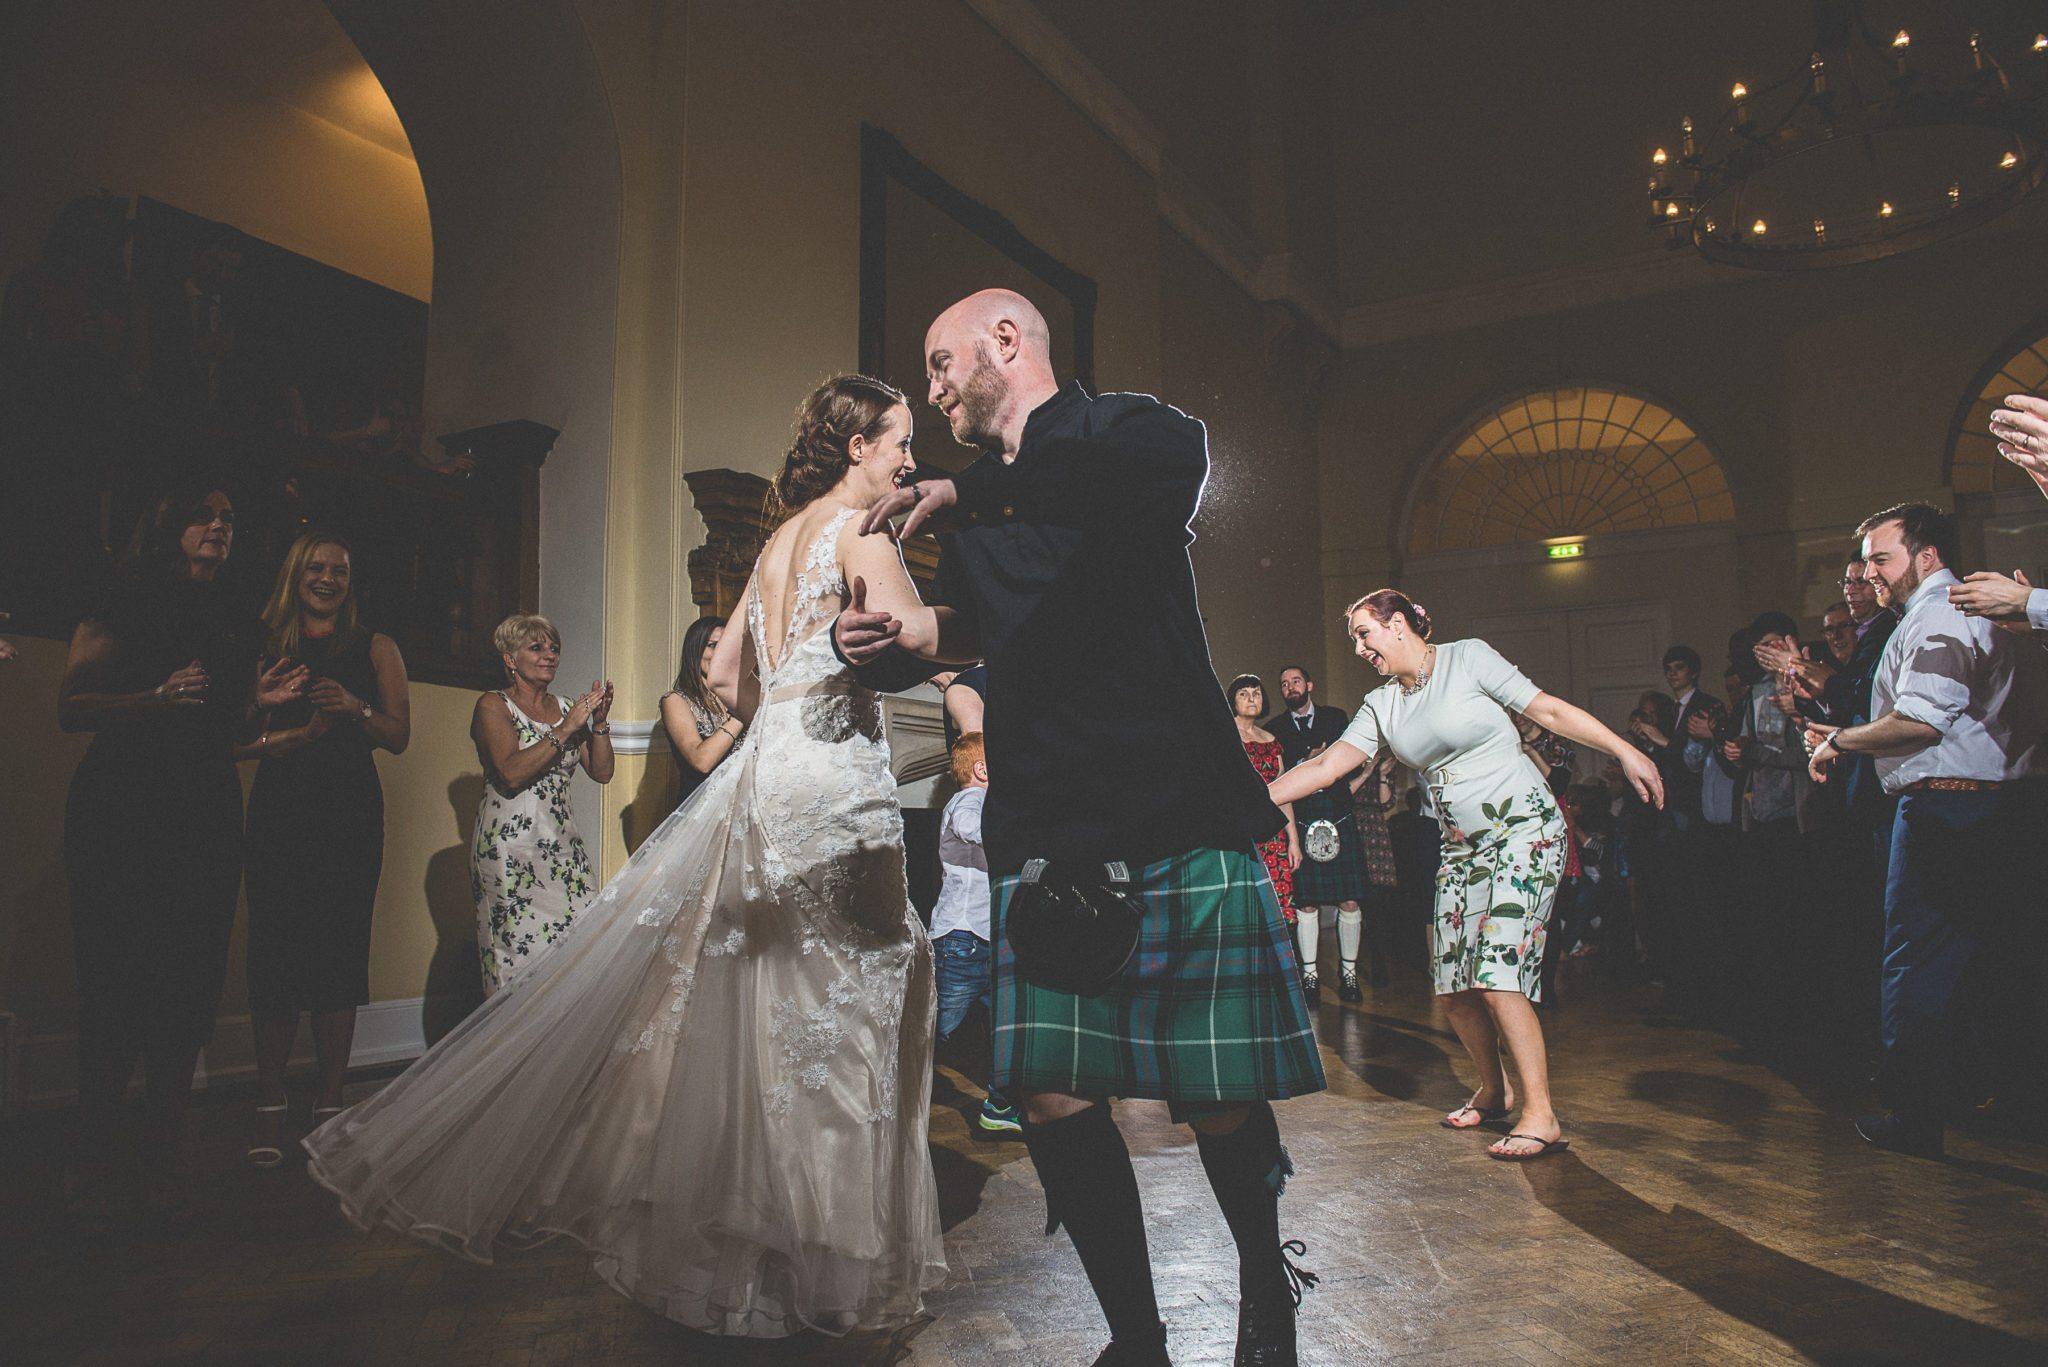 Bride and Groom dancing Ceilidh at their unique sci-fi Farnham Castle Wedding